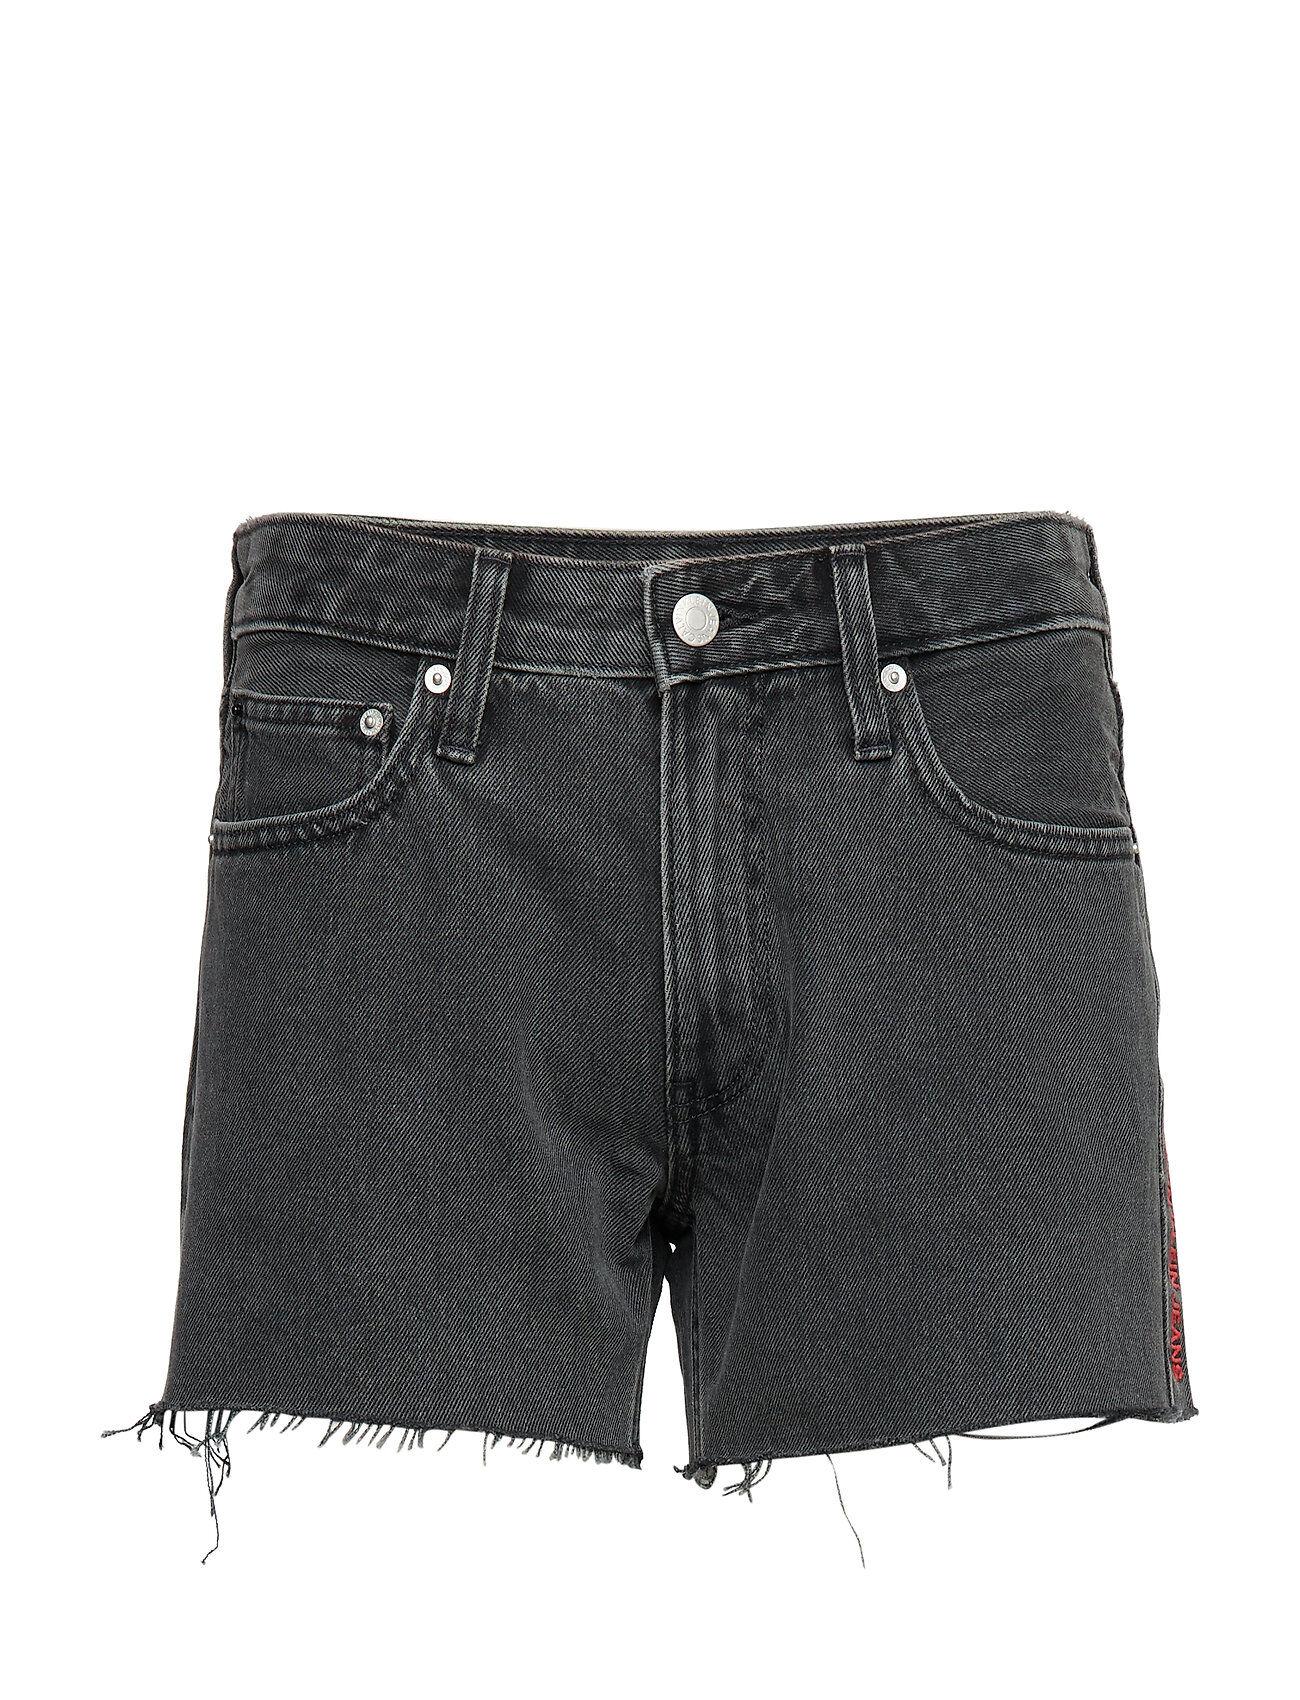 Image of Calvin Mid Rise Weekend Short Shorts Denim Shorts Harmaa Calvin Klein Jeans